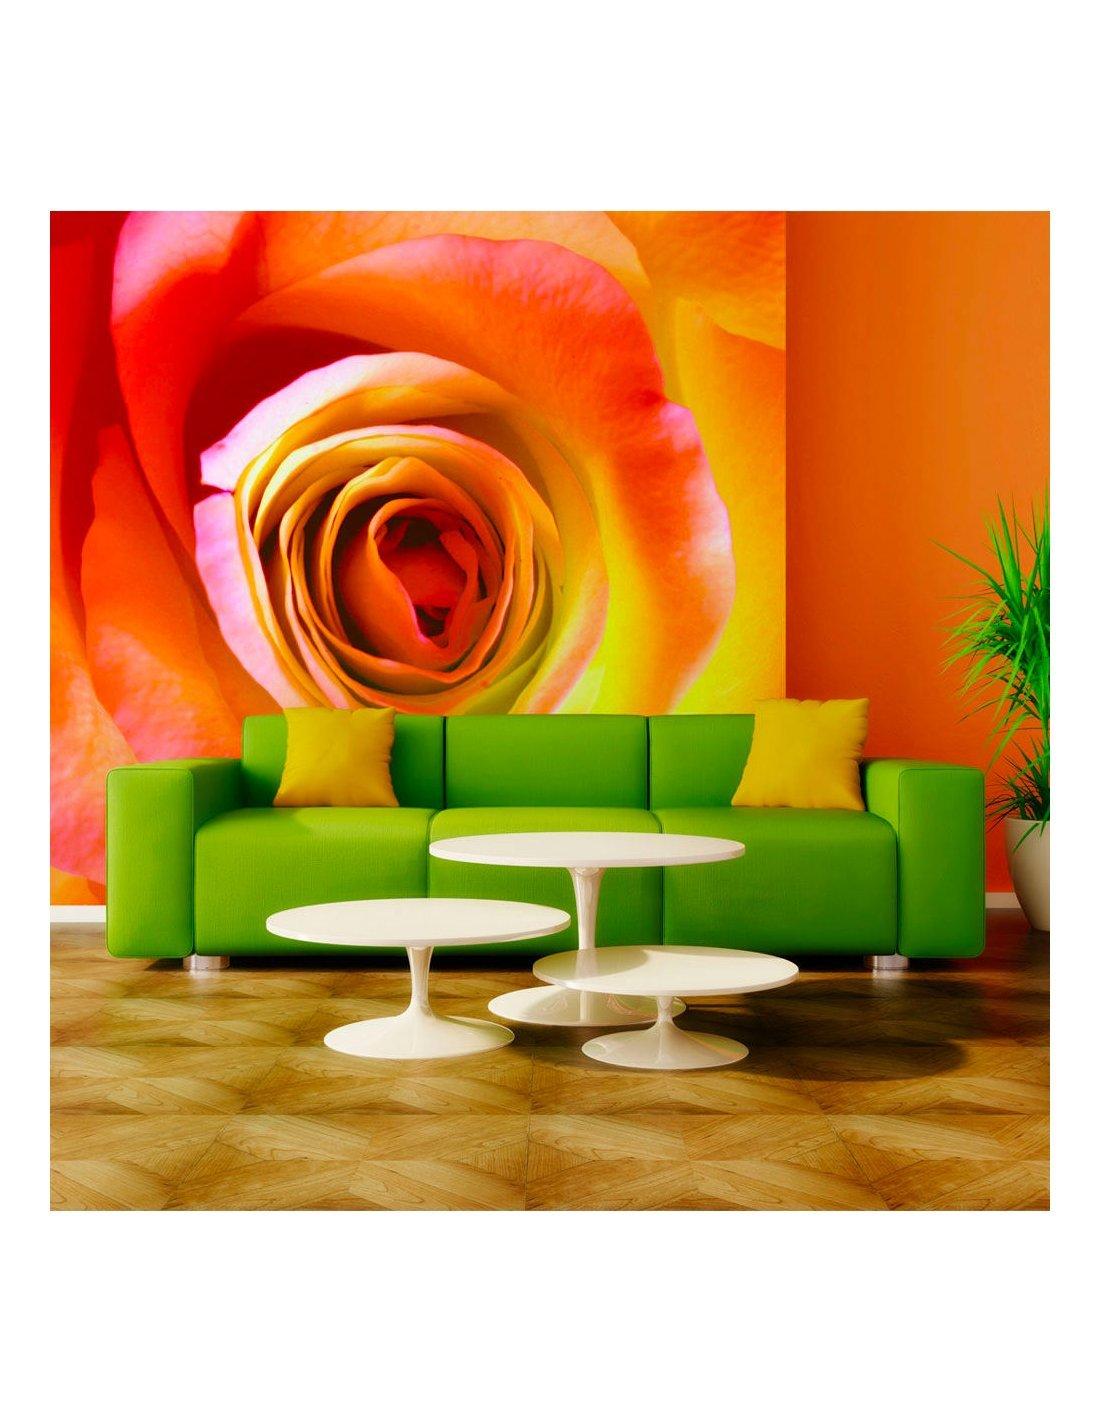 papier peint rose du d sert artgeist. Black Bedroom Furniture Sets. Home Design Ideas